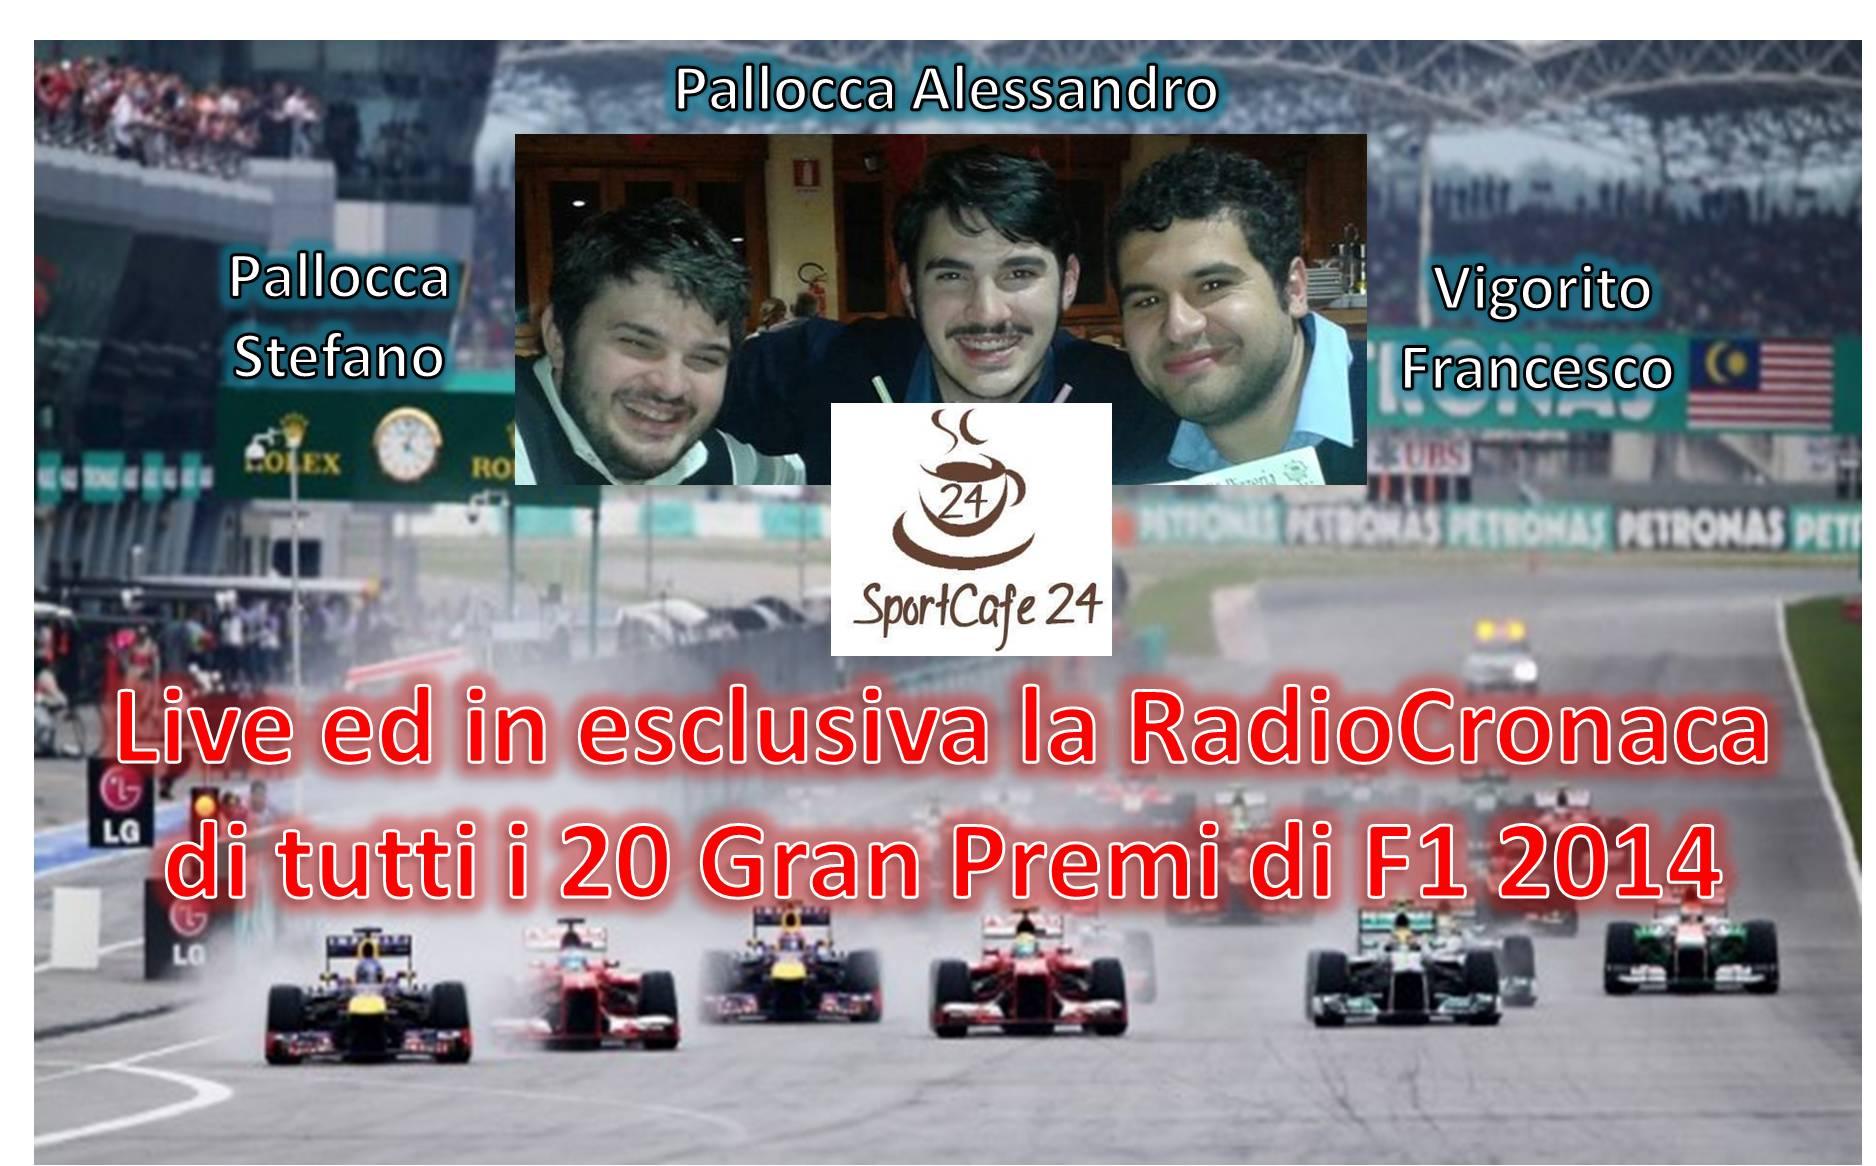 Sportcafè24-Radiocronaca Promo F1 2014